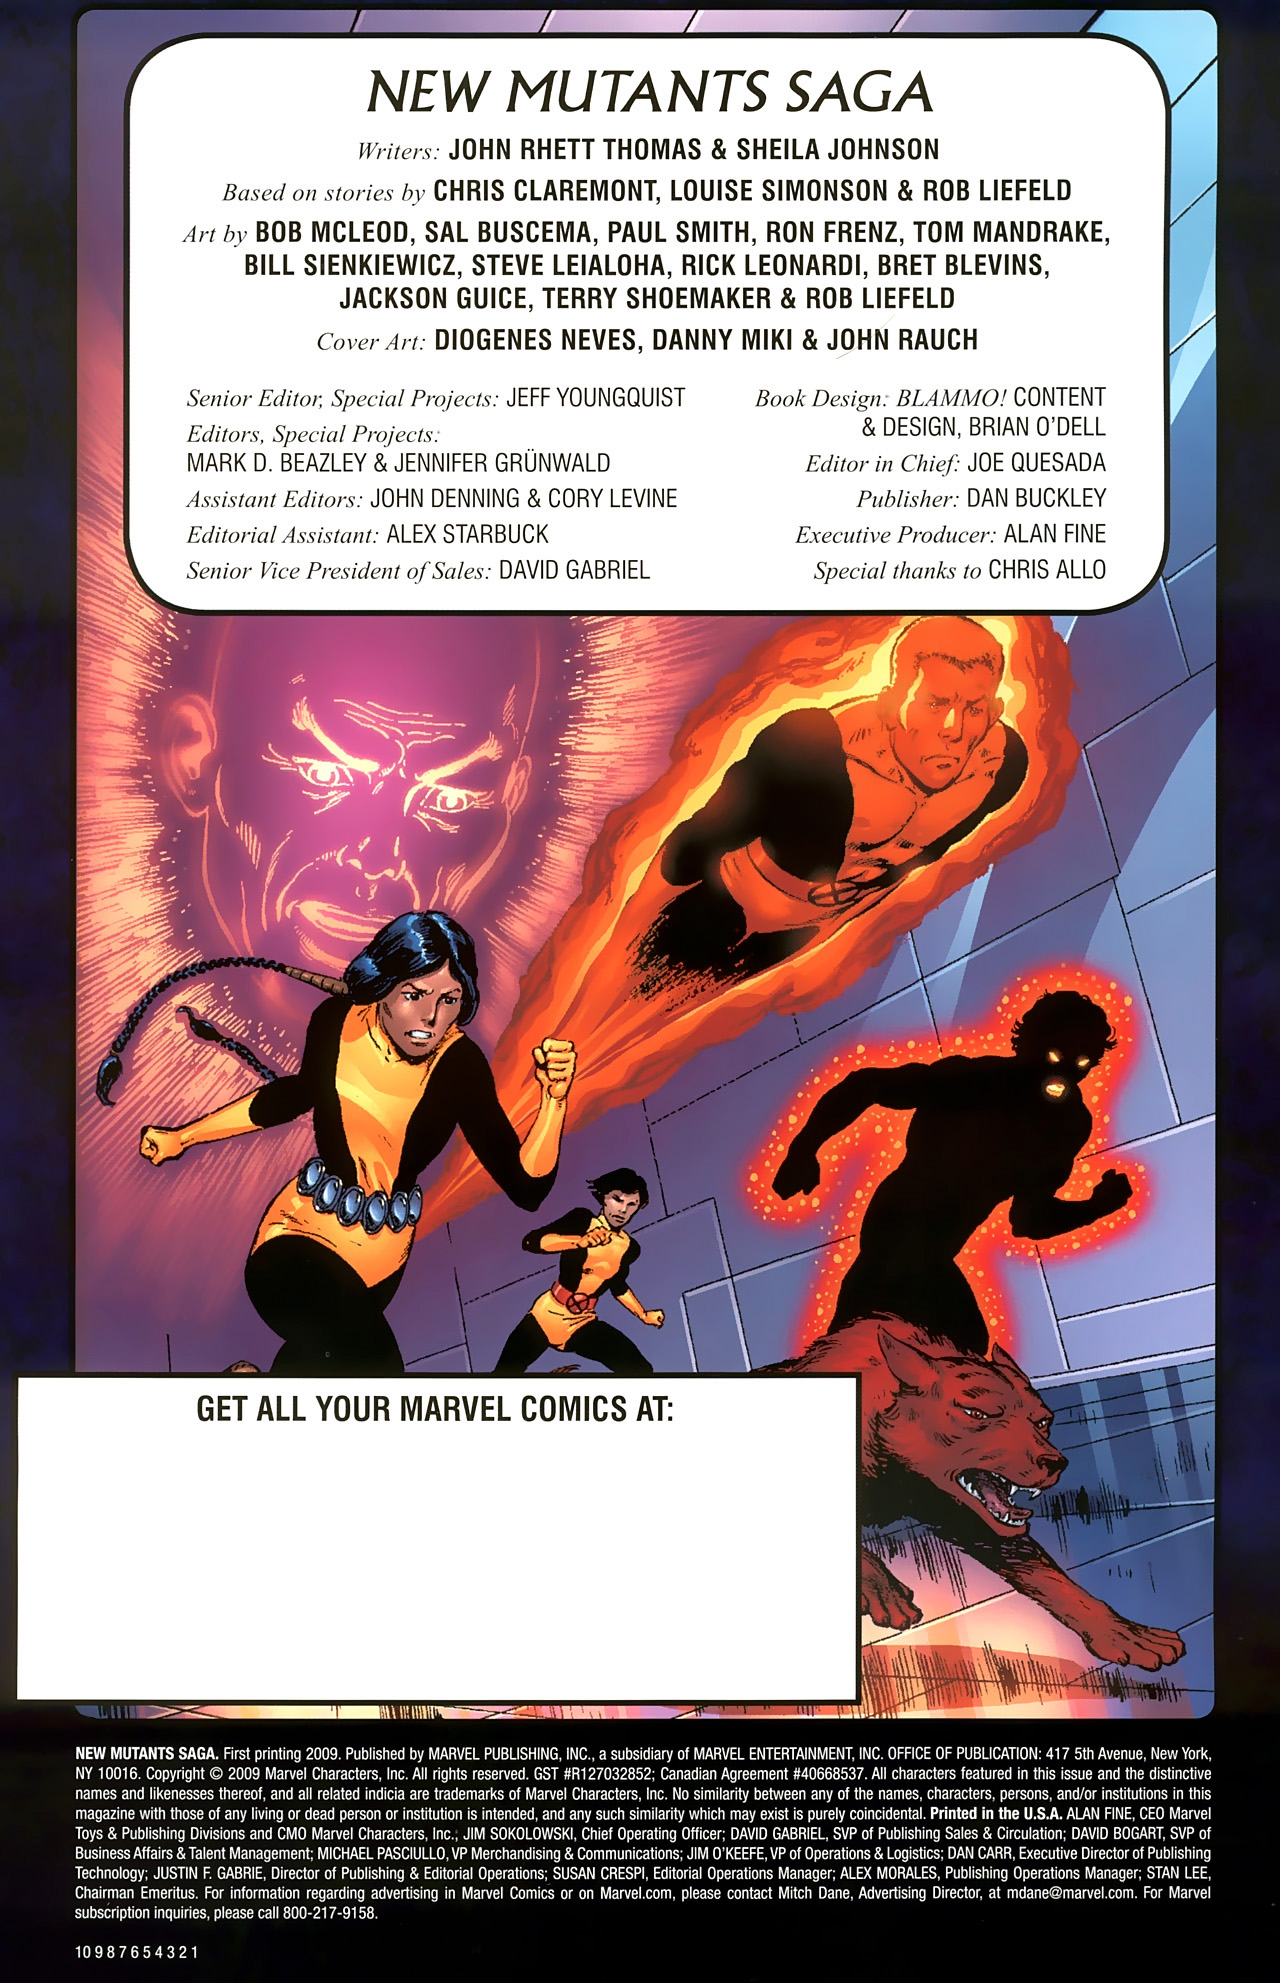 Read online New Mutants Saga comic -  Issue # Full - 2